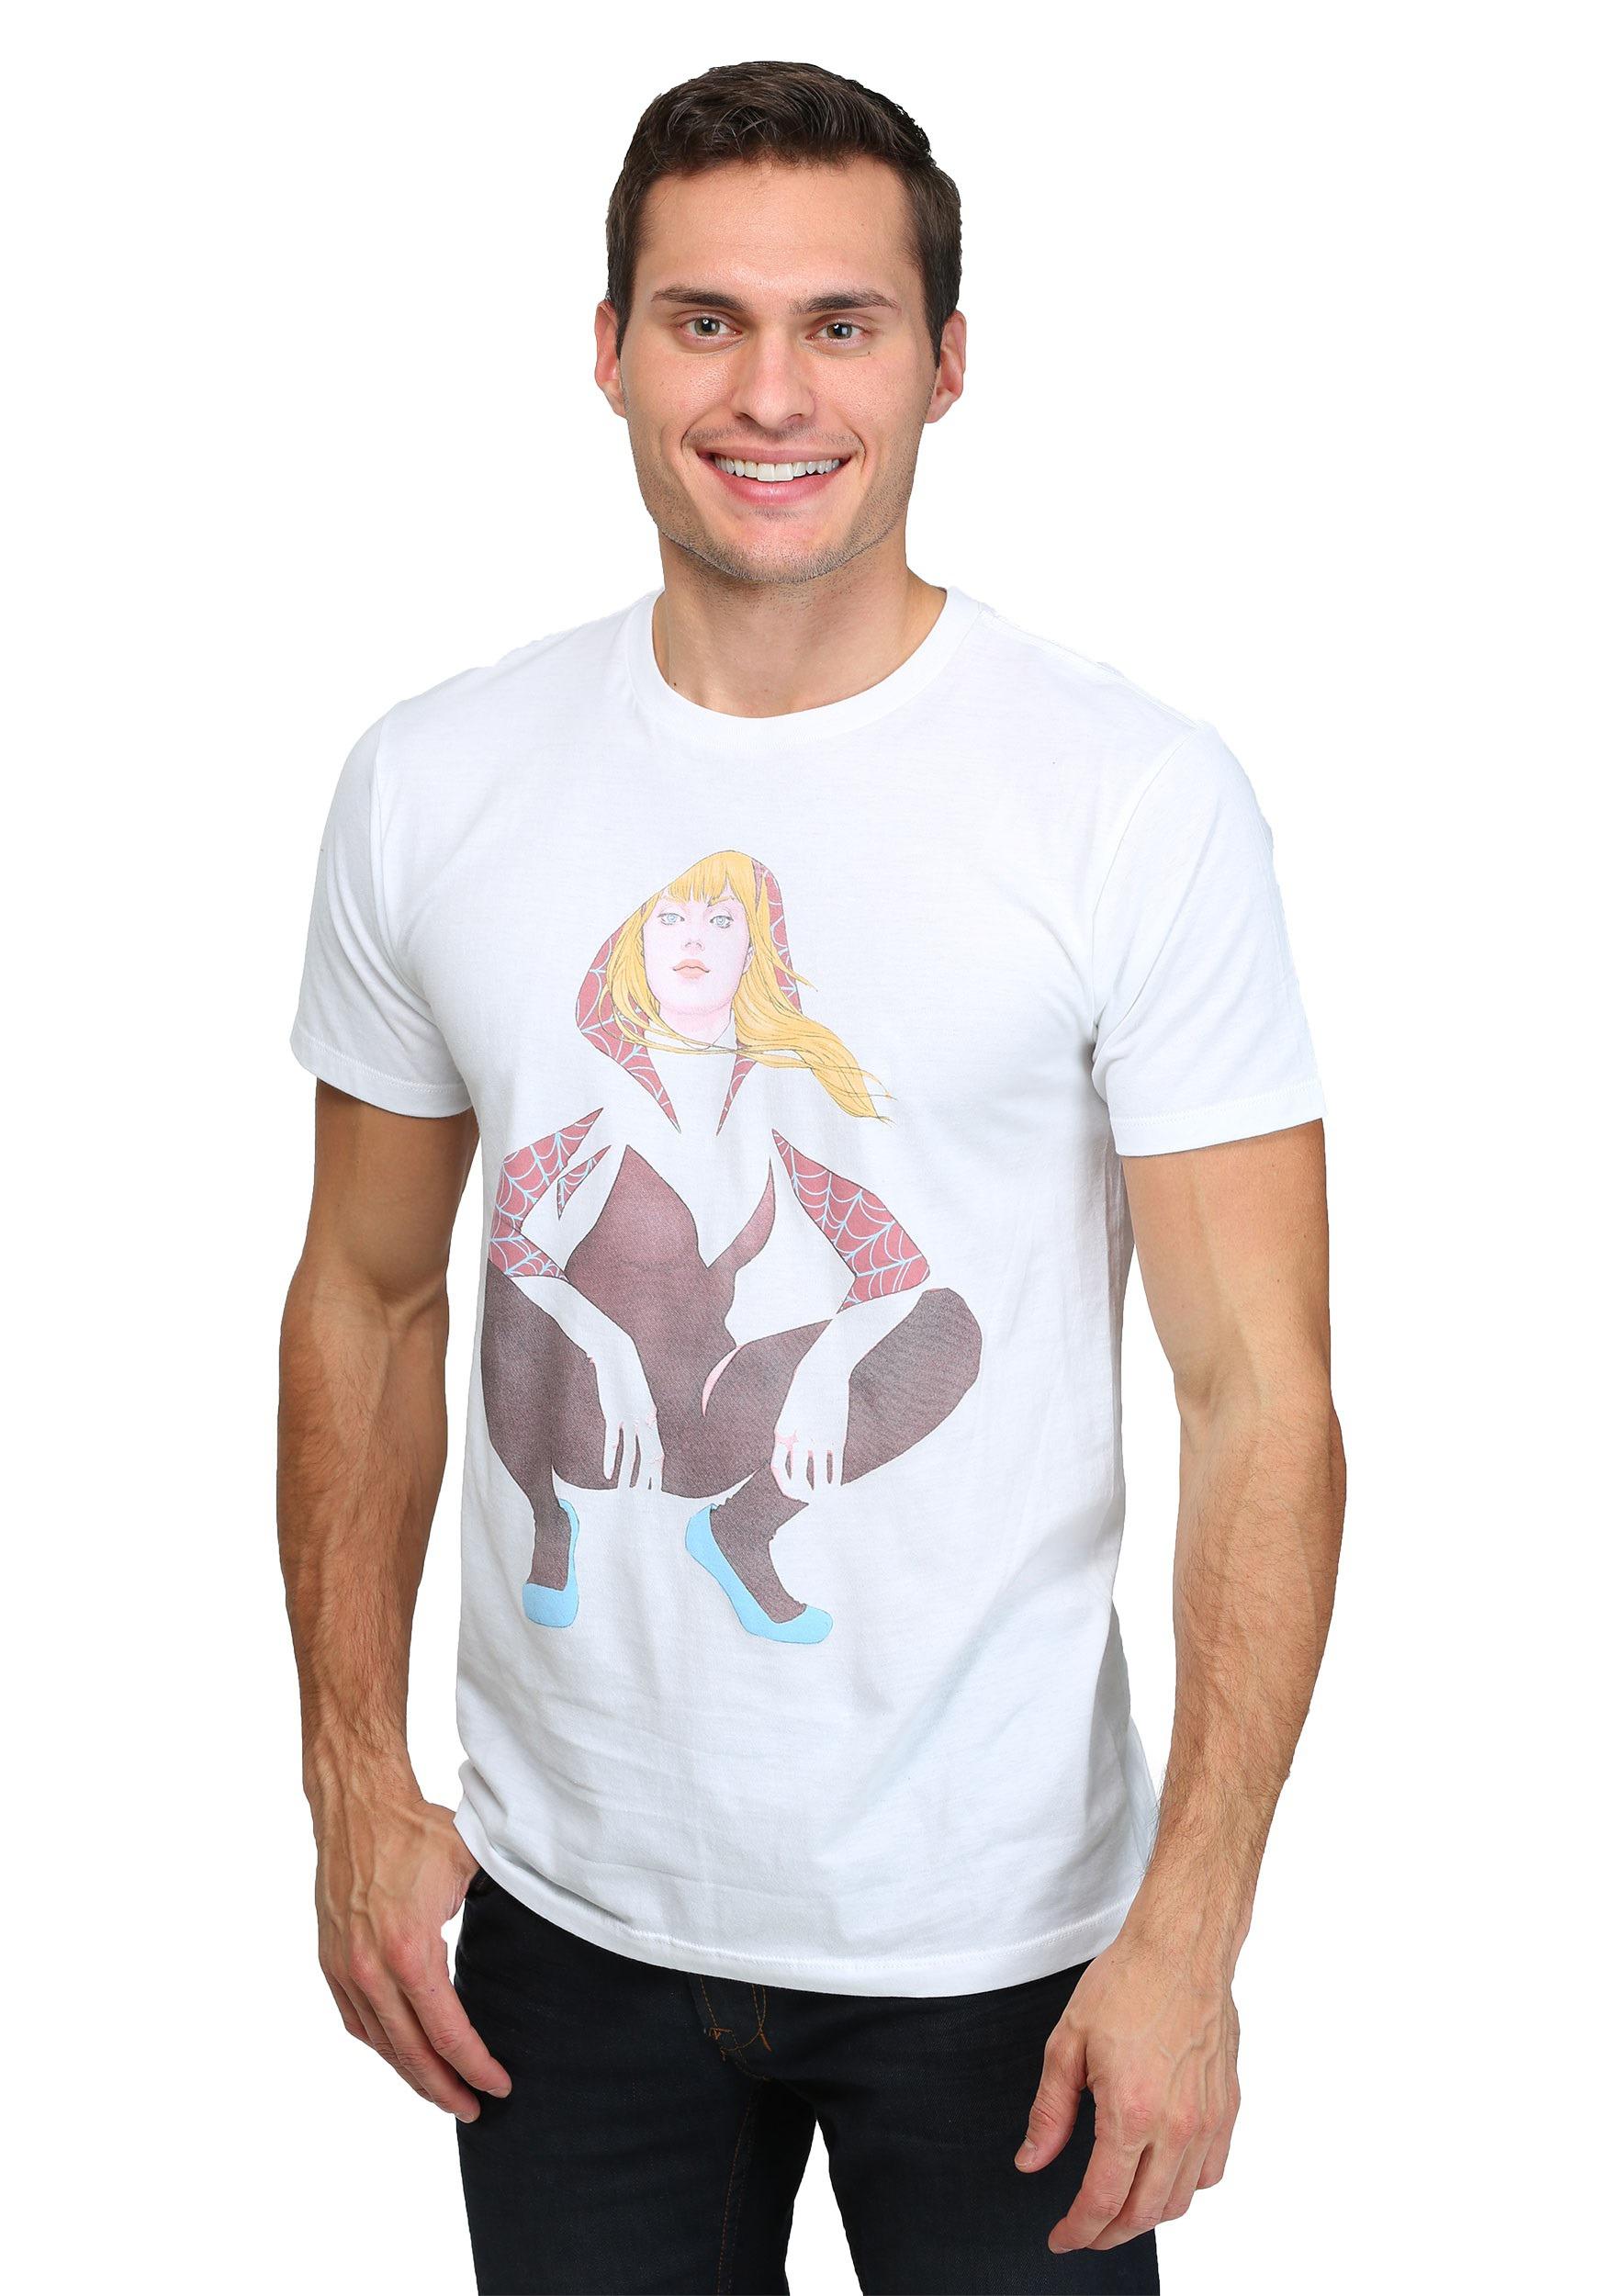 T shirt men white